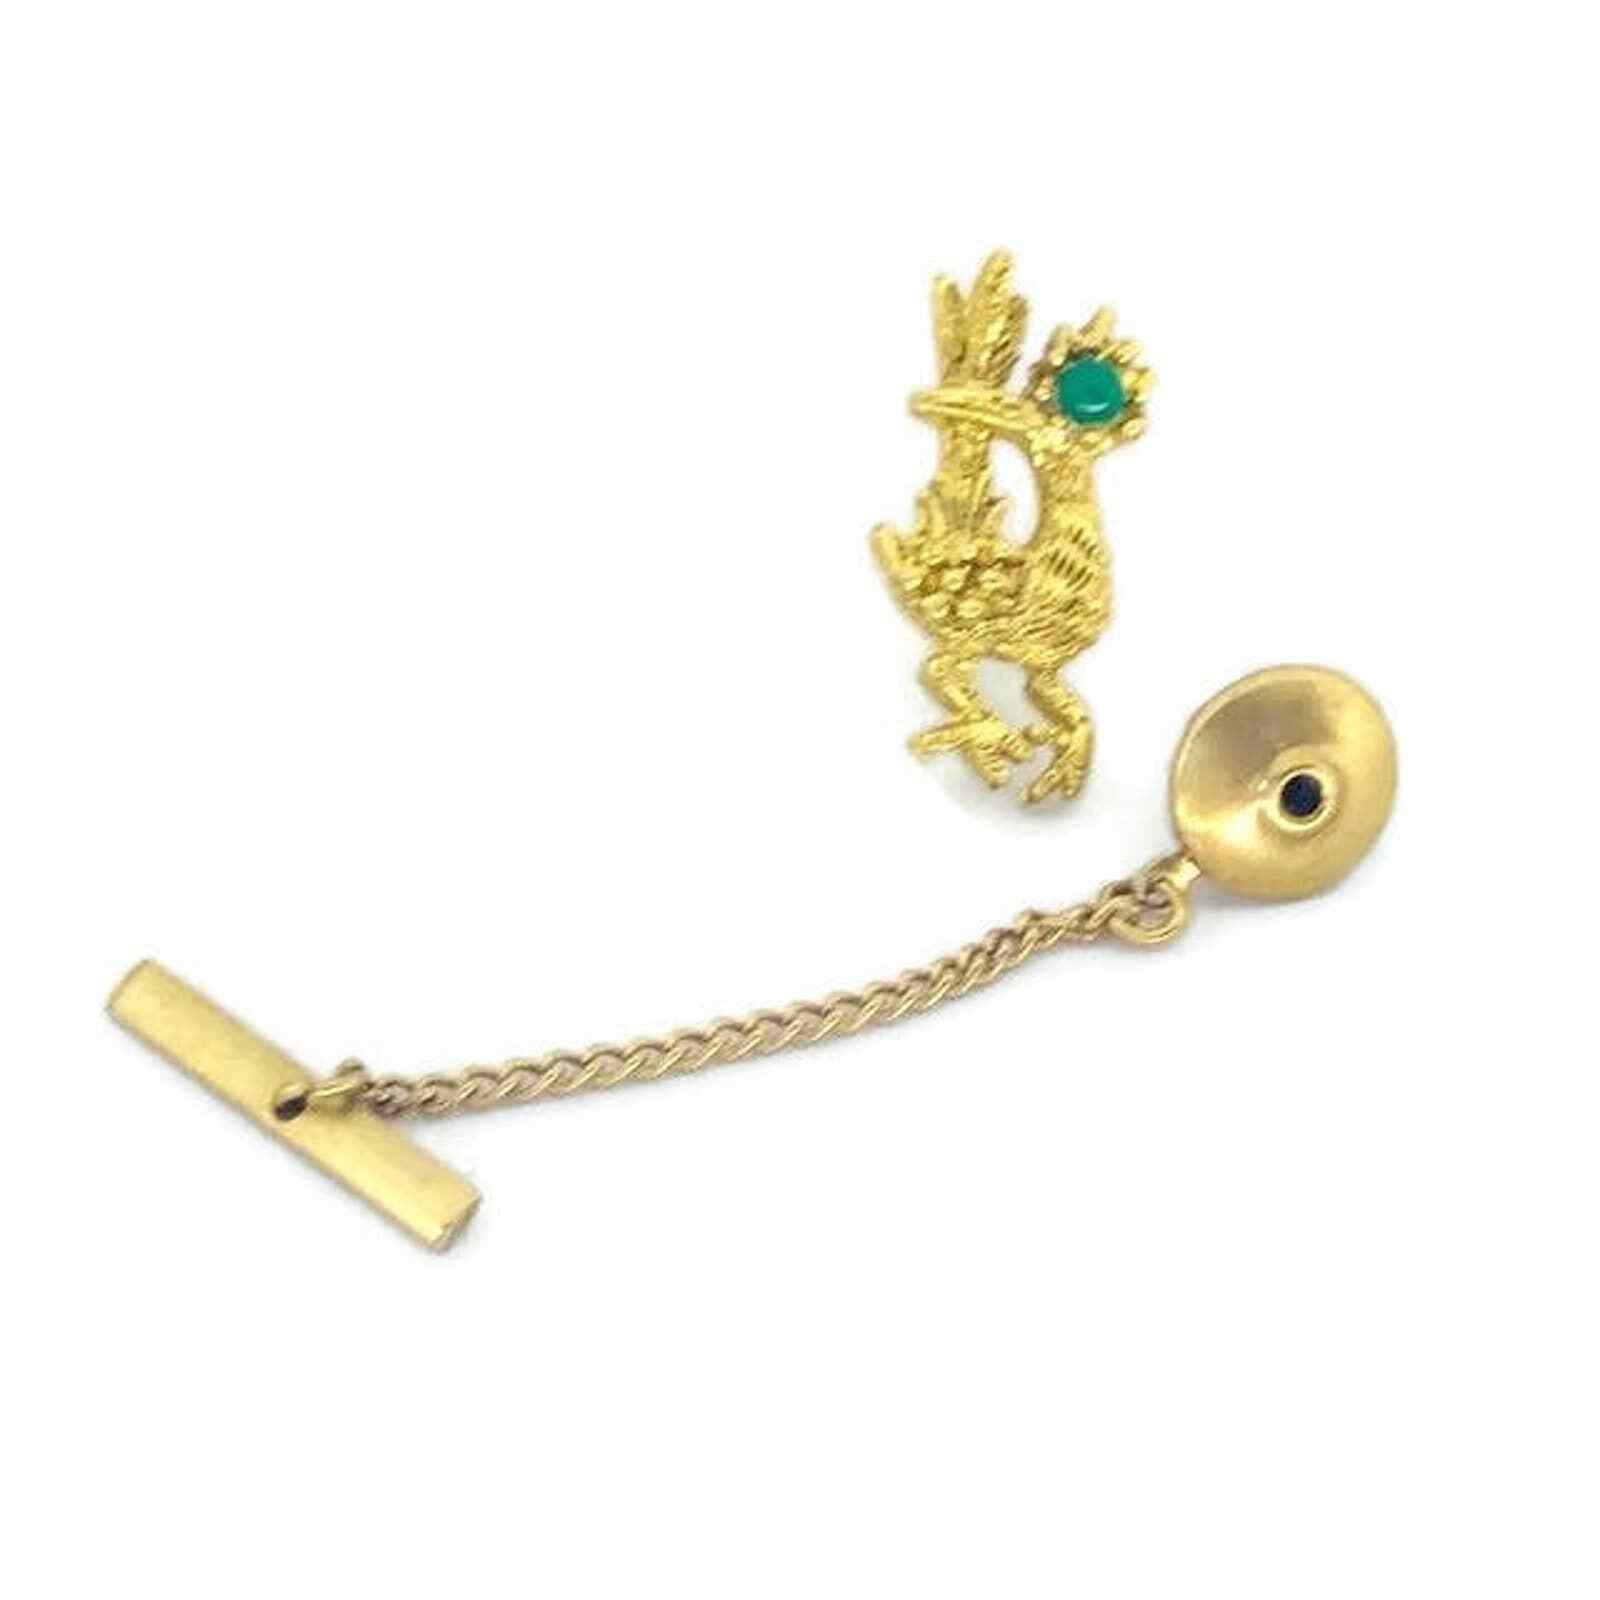 Vintage Gold & Green Roadrunner Tie Pin, Bird Tie Tack, Bird Tie Pin